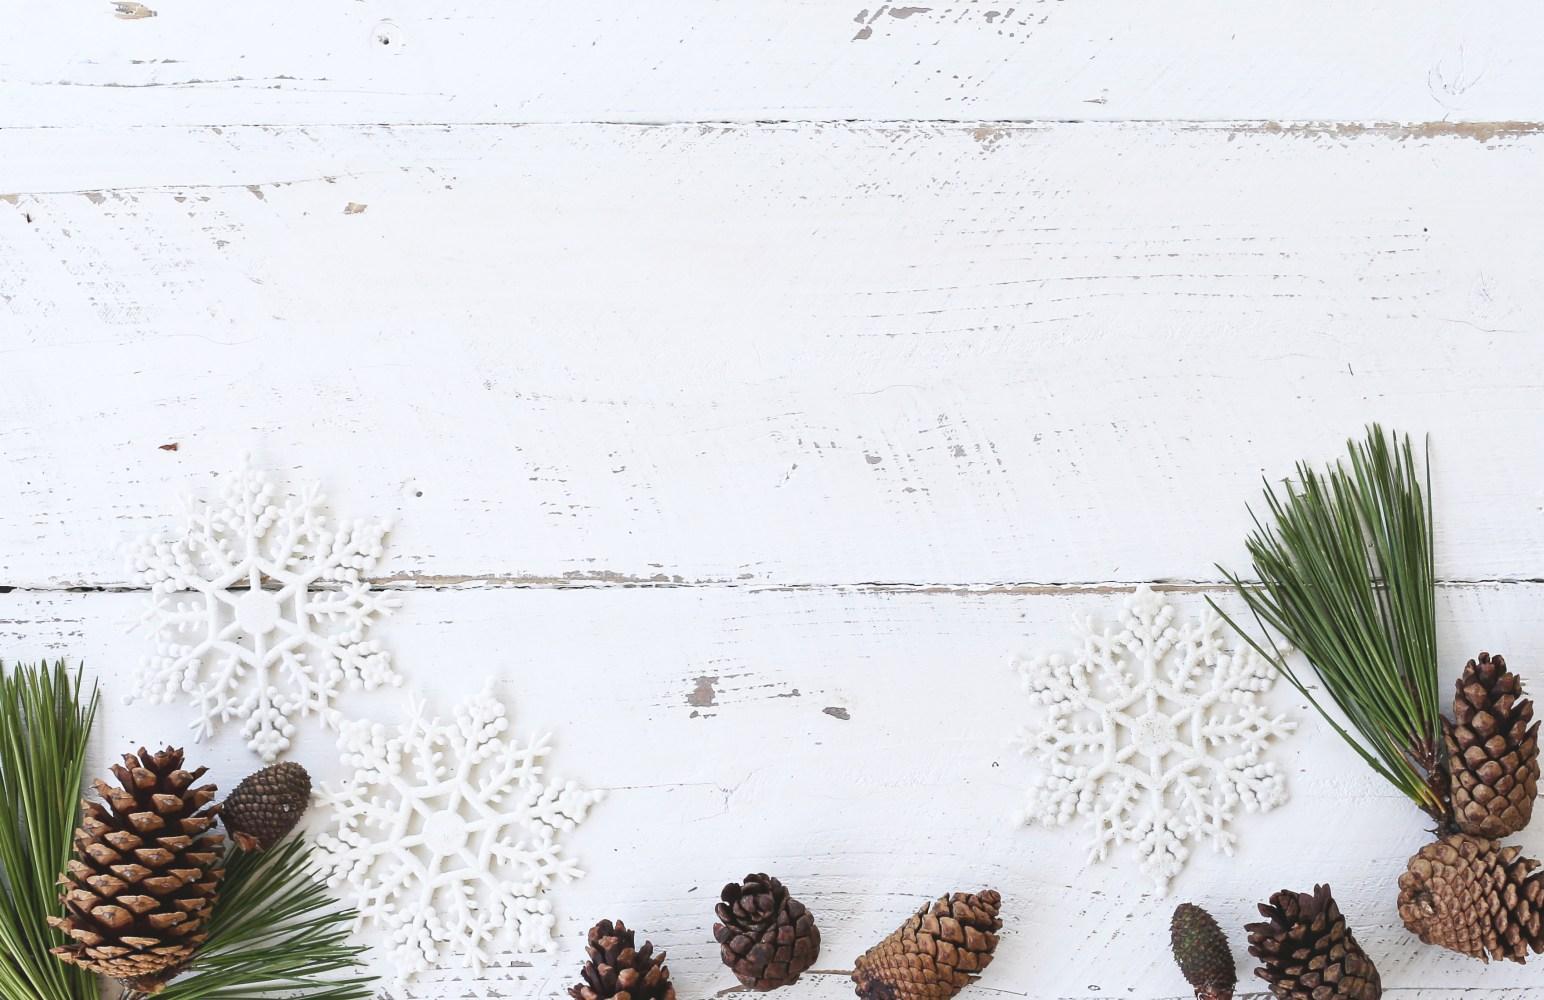 Car Dash Wallpaper Christmas Images 183 Pexels 183 Free Stock Photos